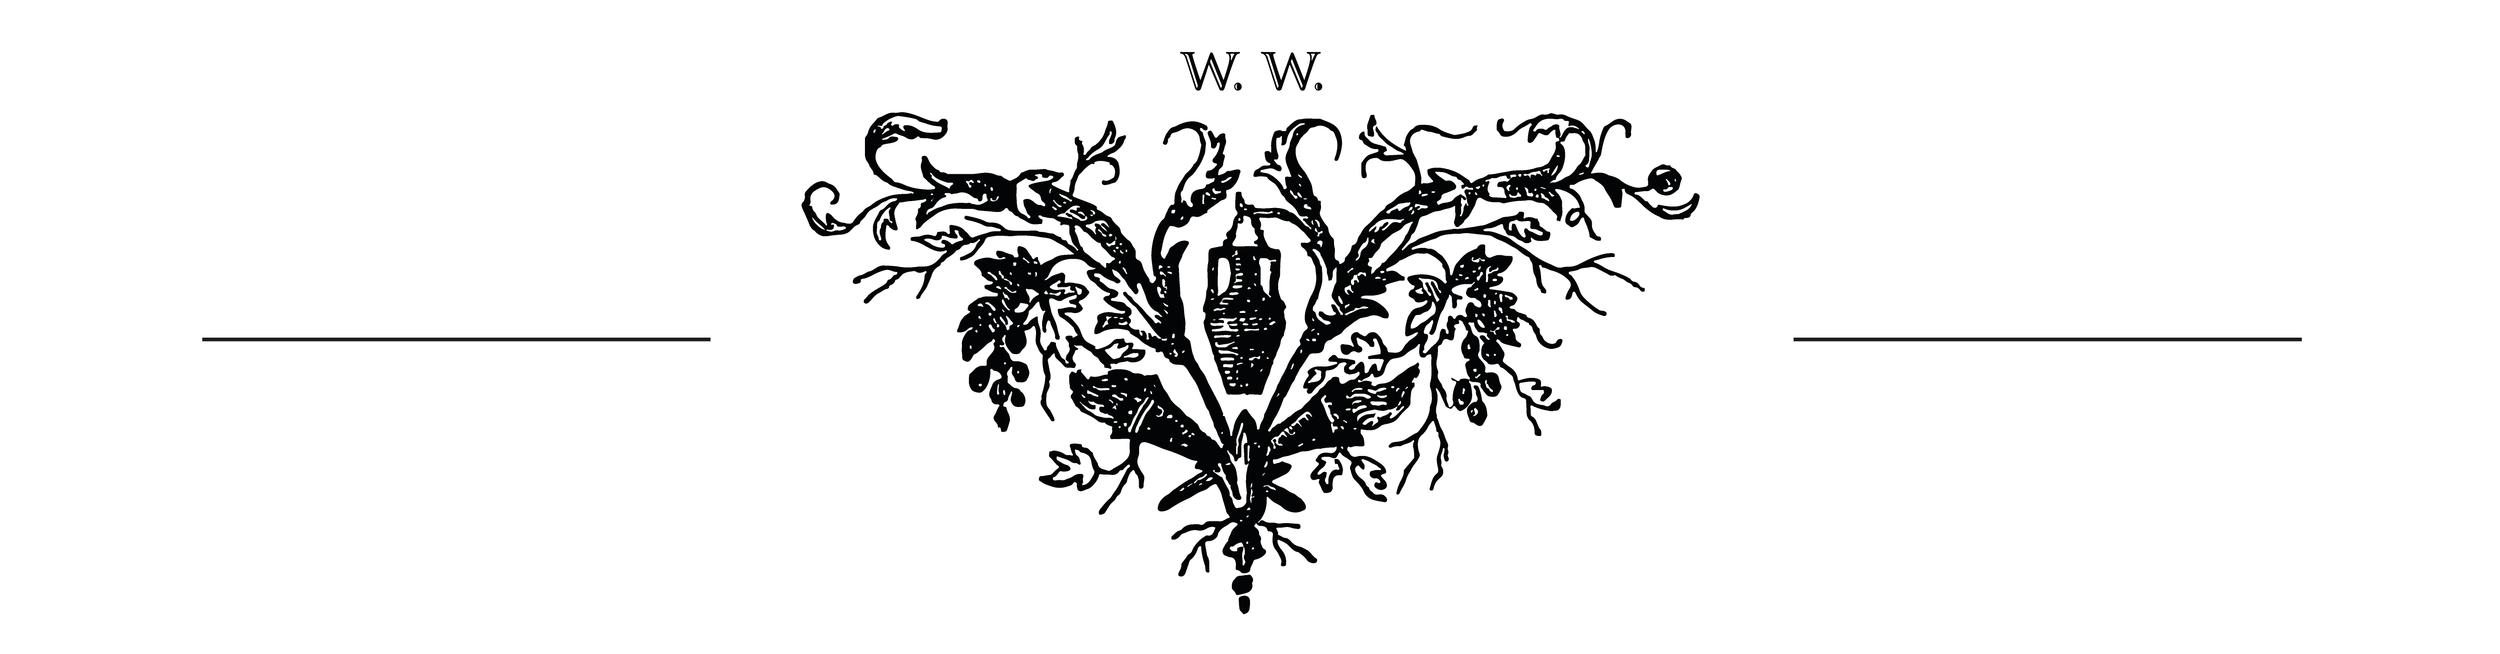 Symbole WW_Plan de travail 1_Plan de travail 1.png